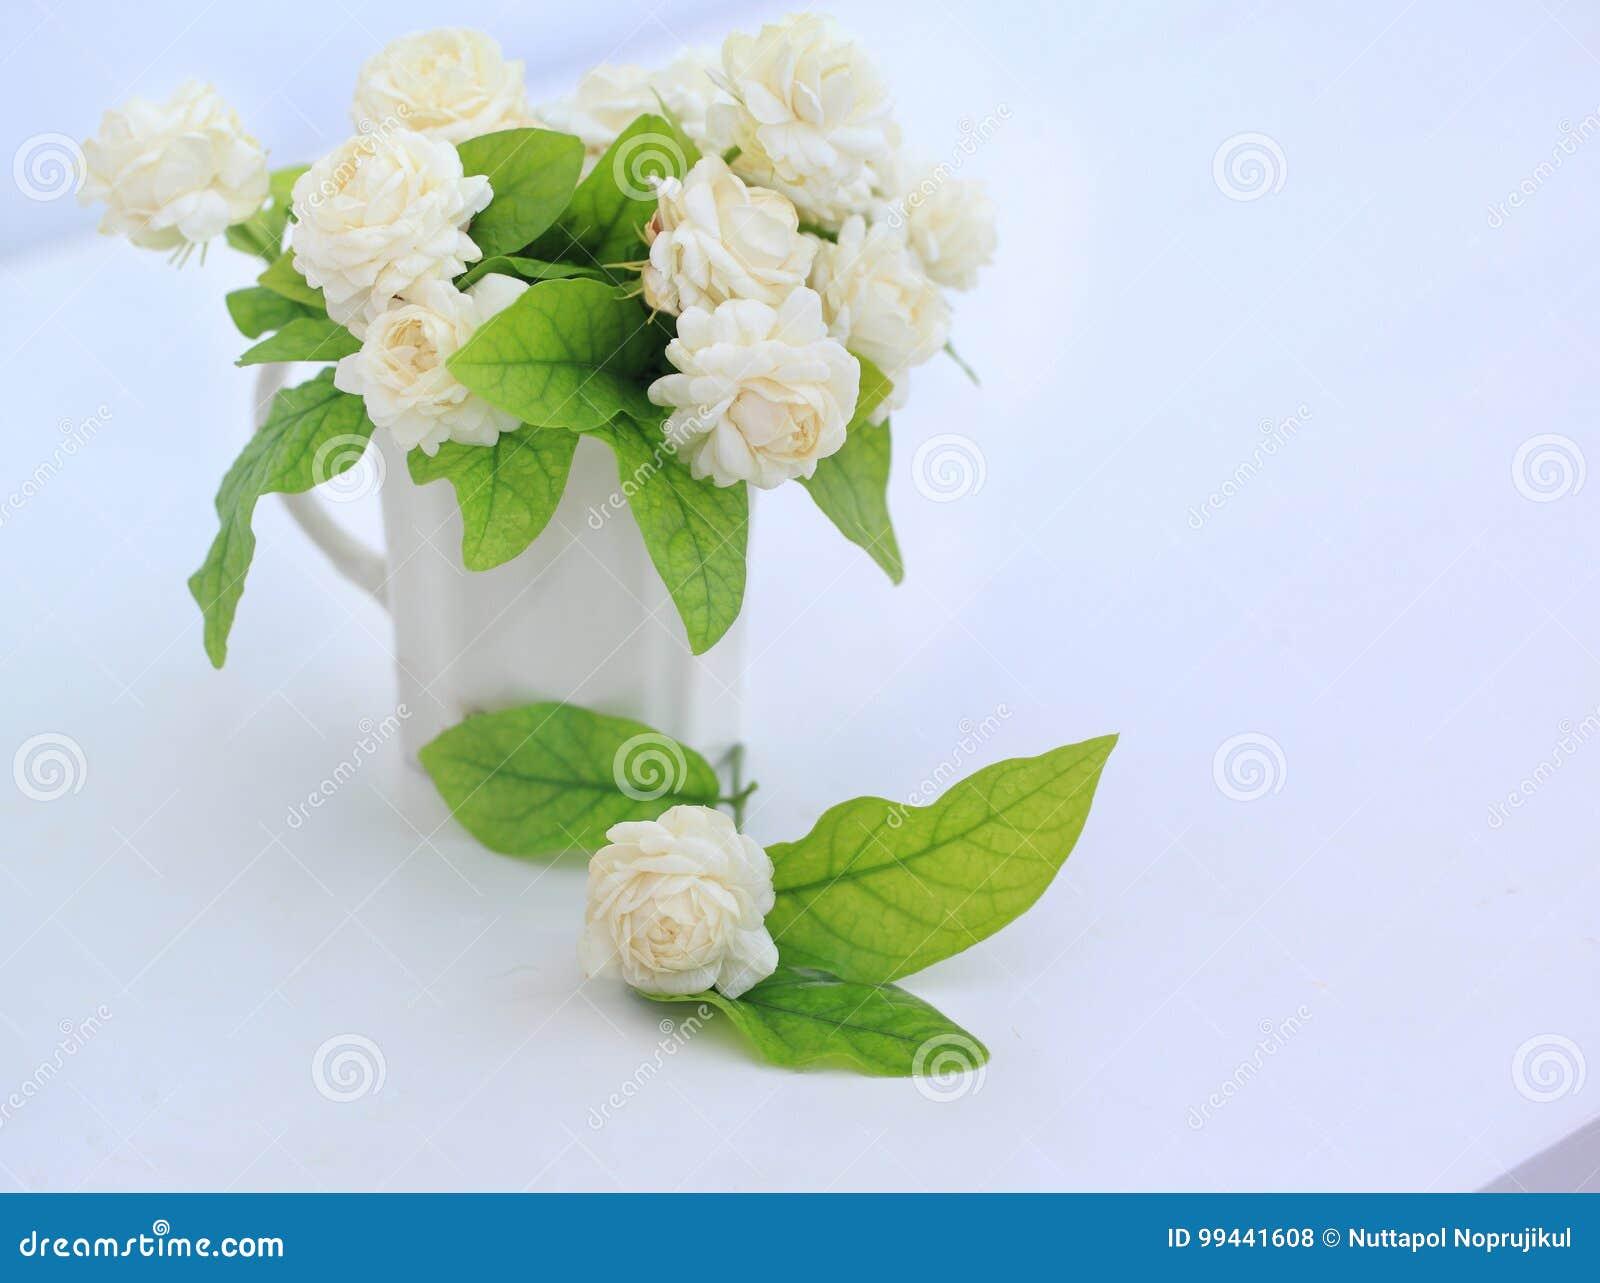 Fine Names Of Wedding Flowers Elaboration - Blue Wedding Color Ideas ...